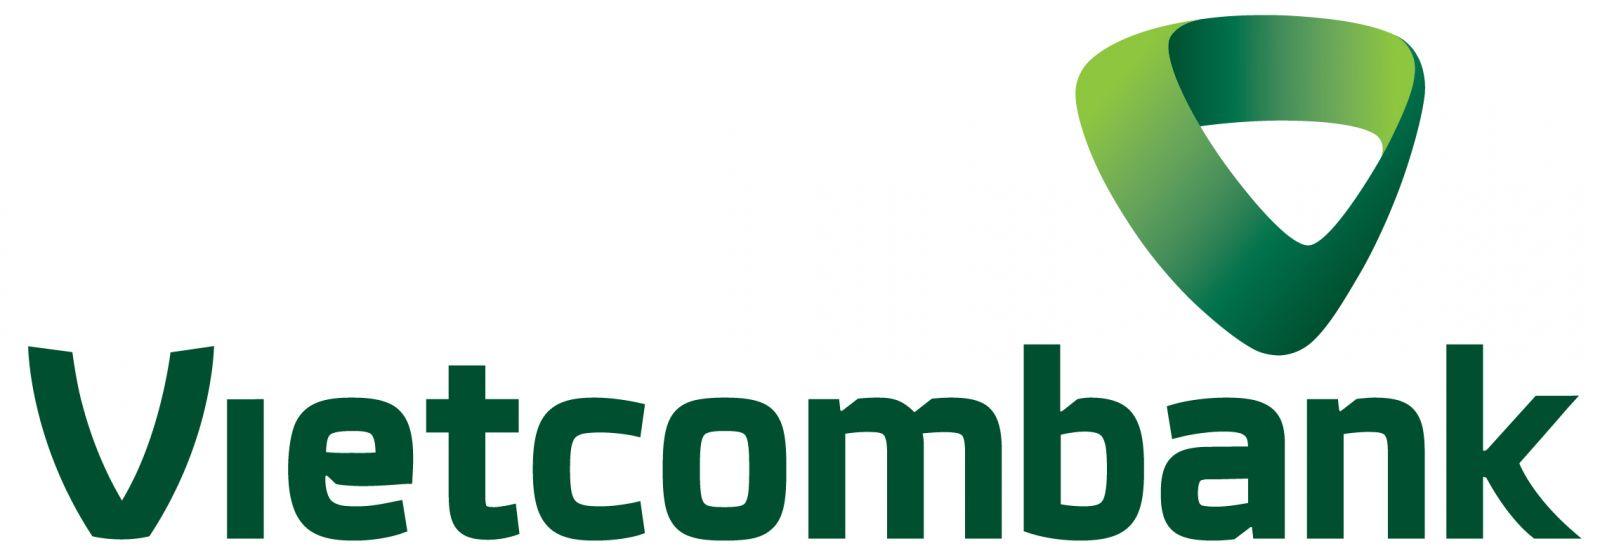 vietcombank-logo